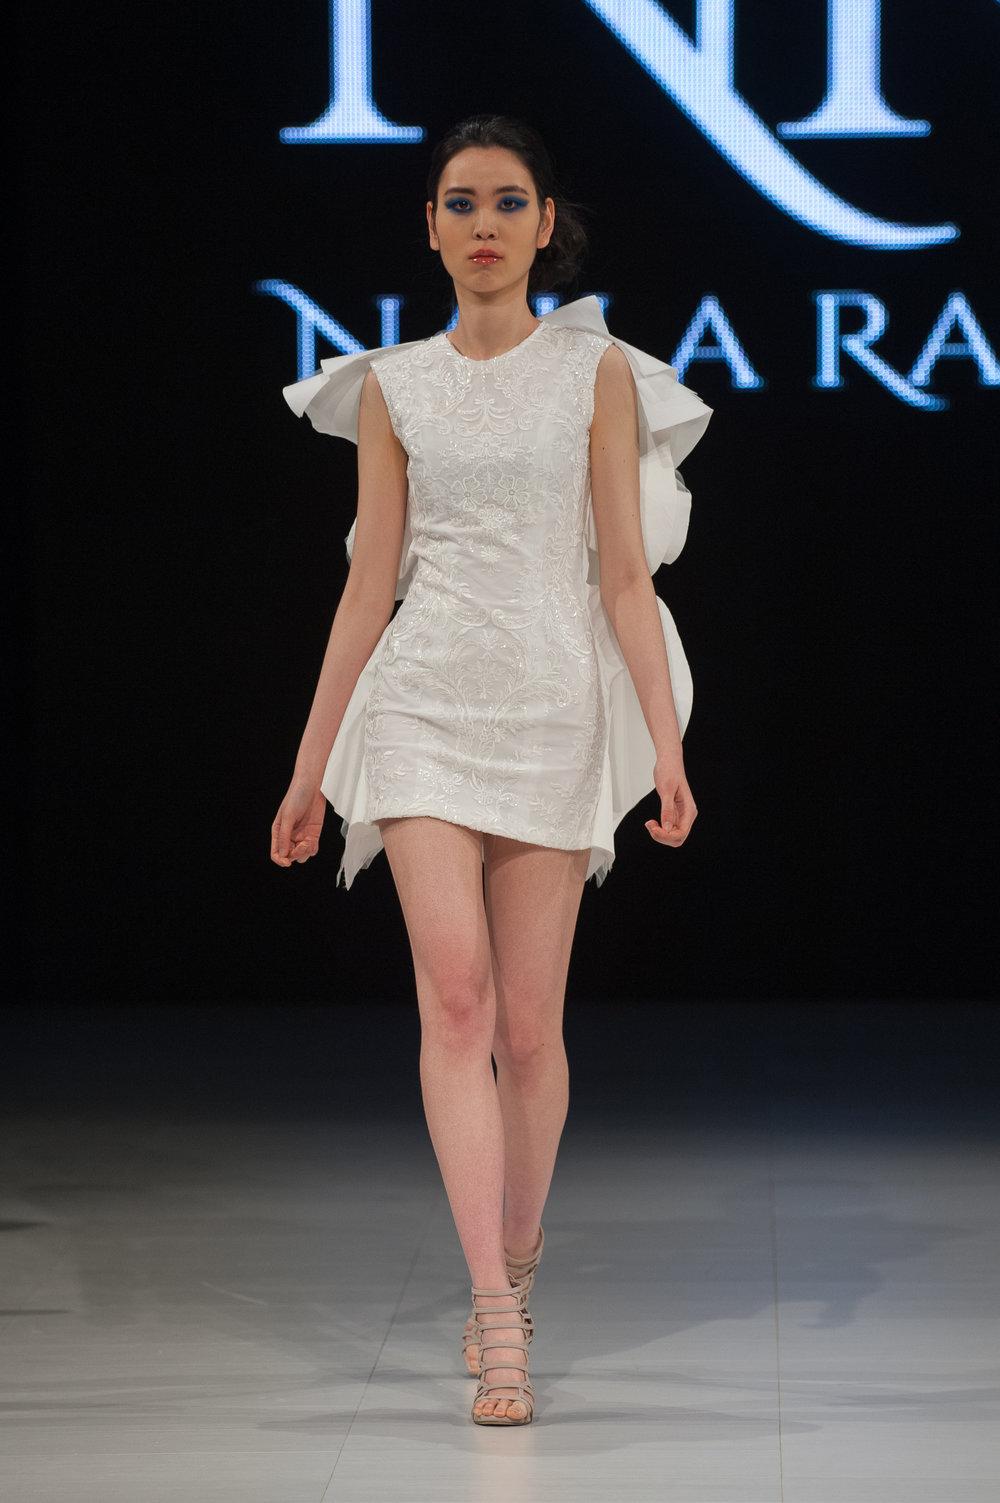 FAT2018-Day1-April17-Najla_Rahimi-Runway-Che_Rosales-LARAWAN-5877.jpg